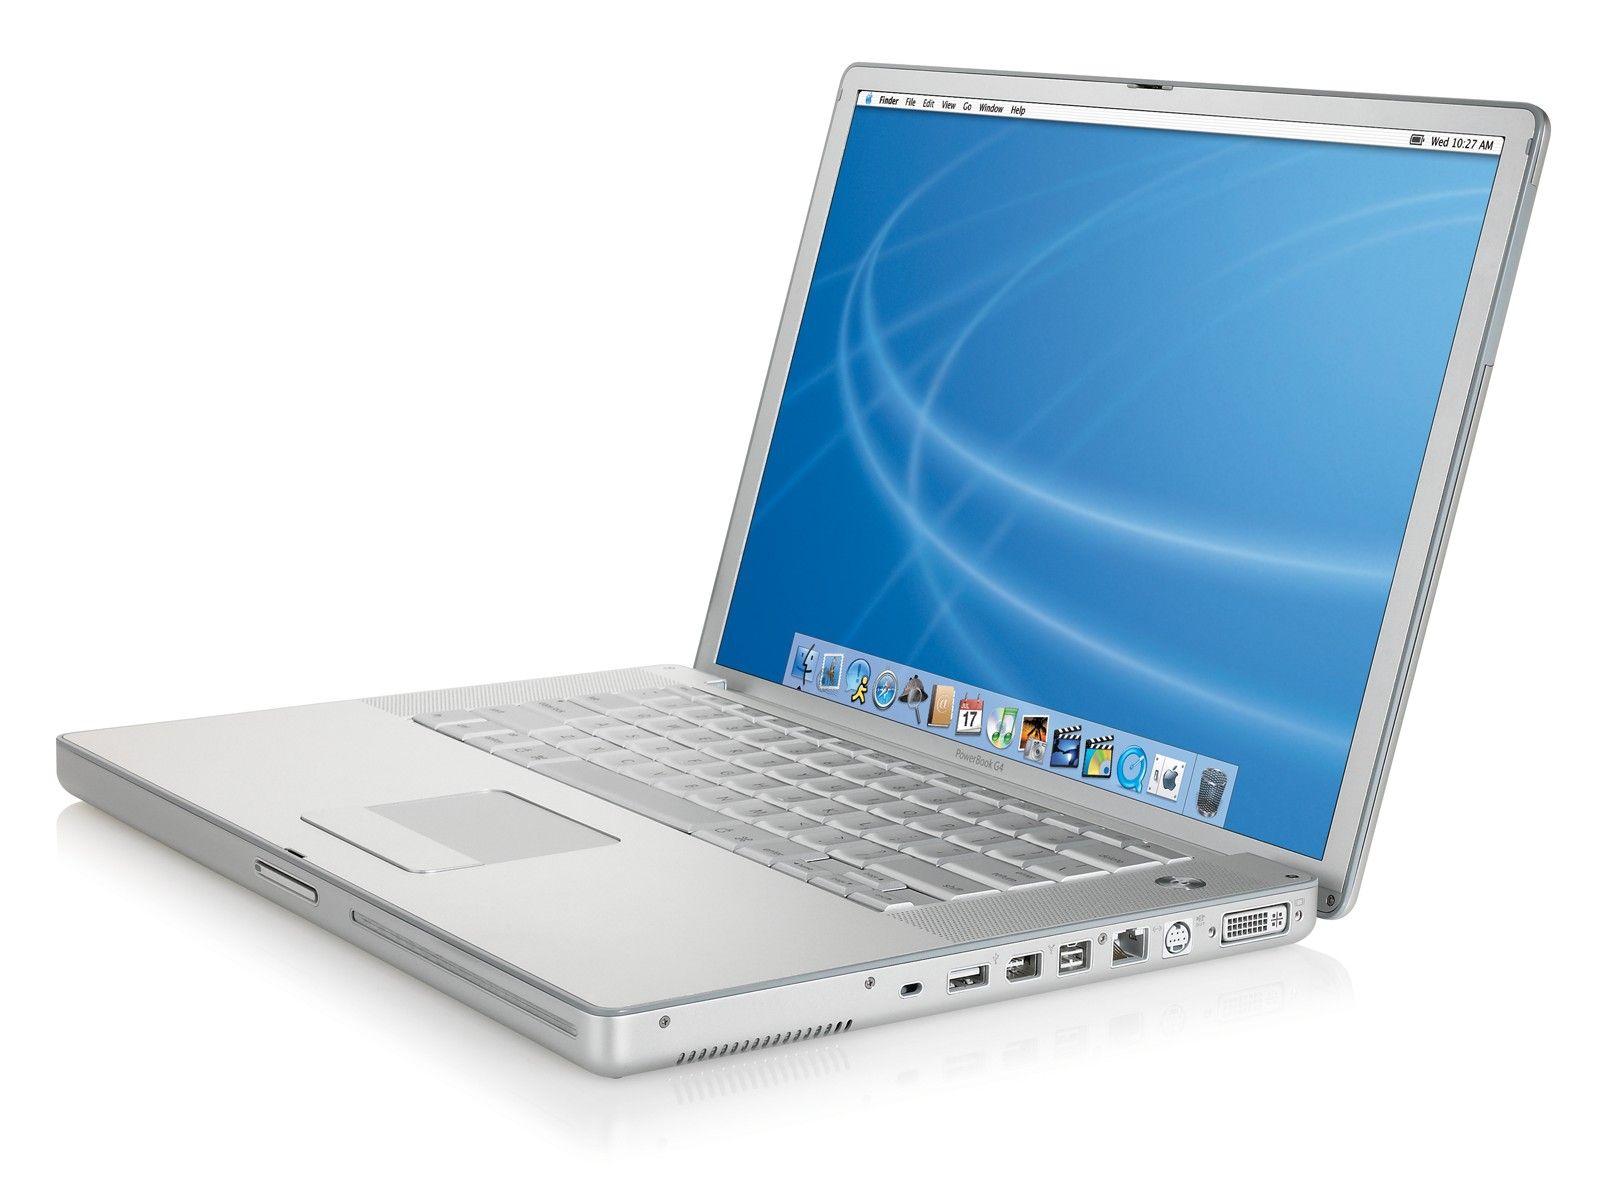 powerbook g4 - Google Search | Apple PowerBook | Pinterest ...